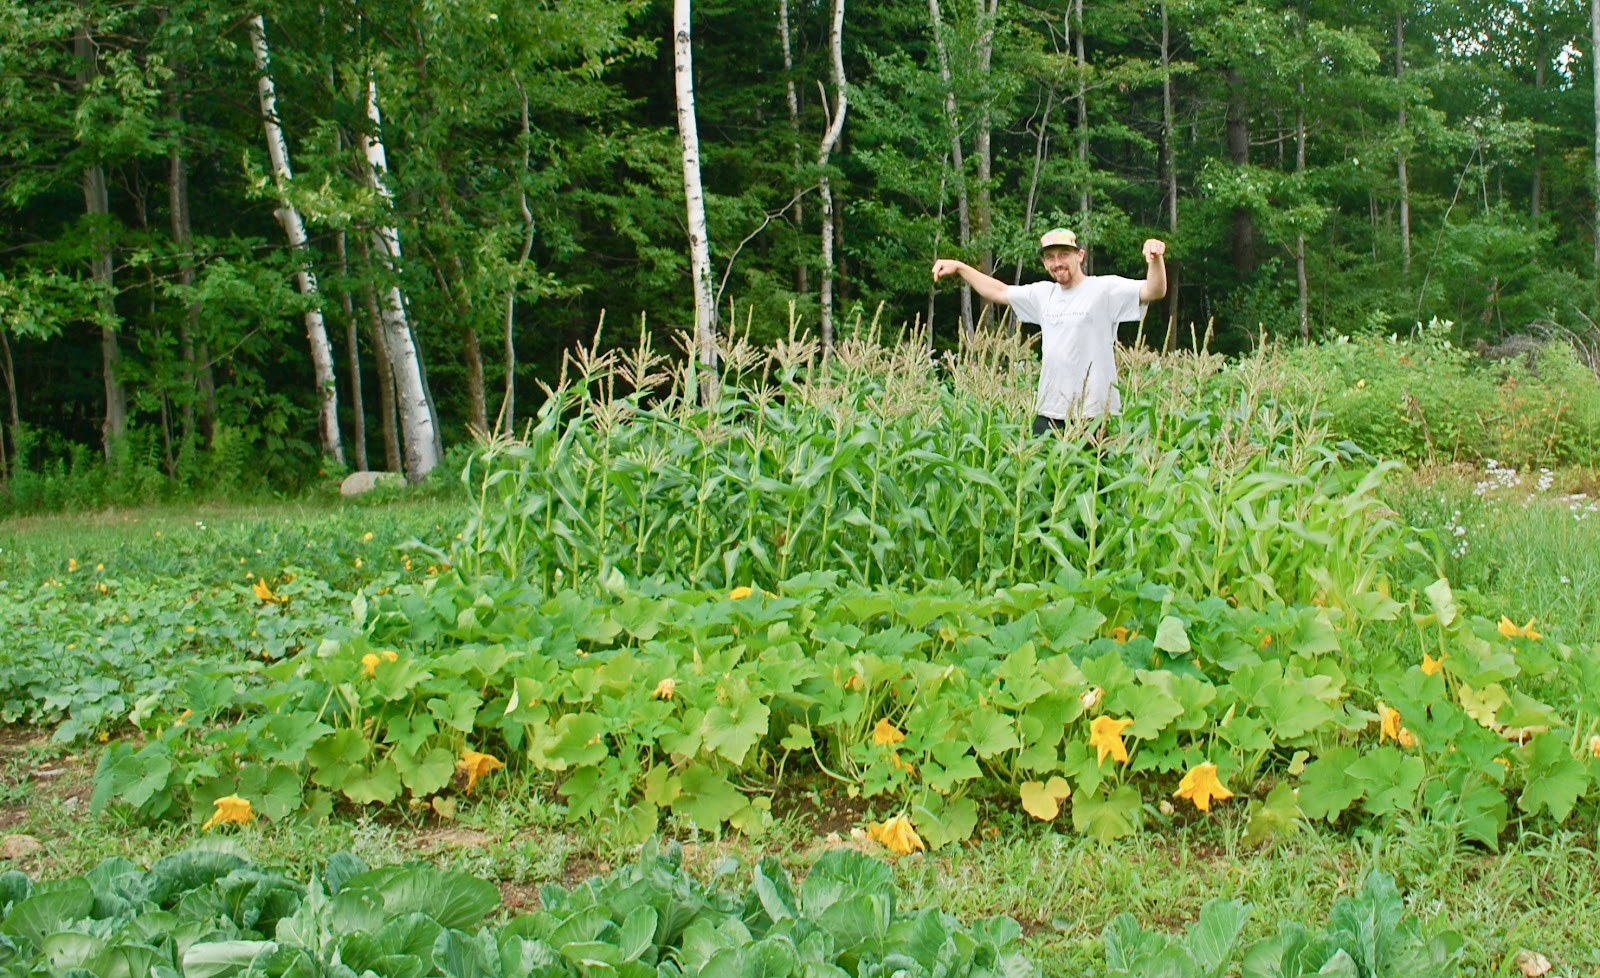 AMC Trails Blog Camp Dodge Garden Expands AMCs Forest Stewardship